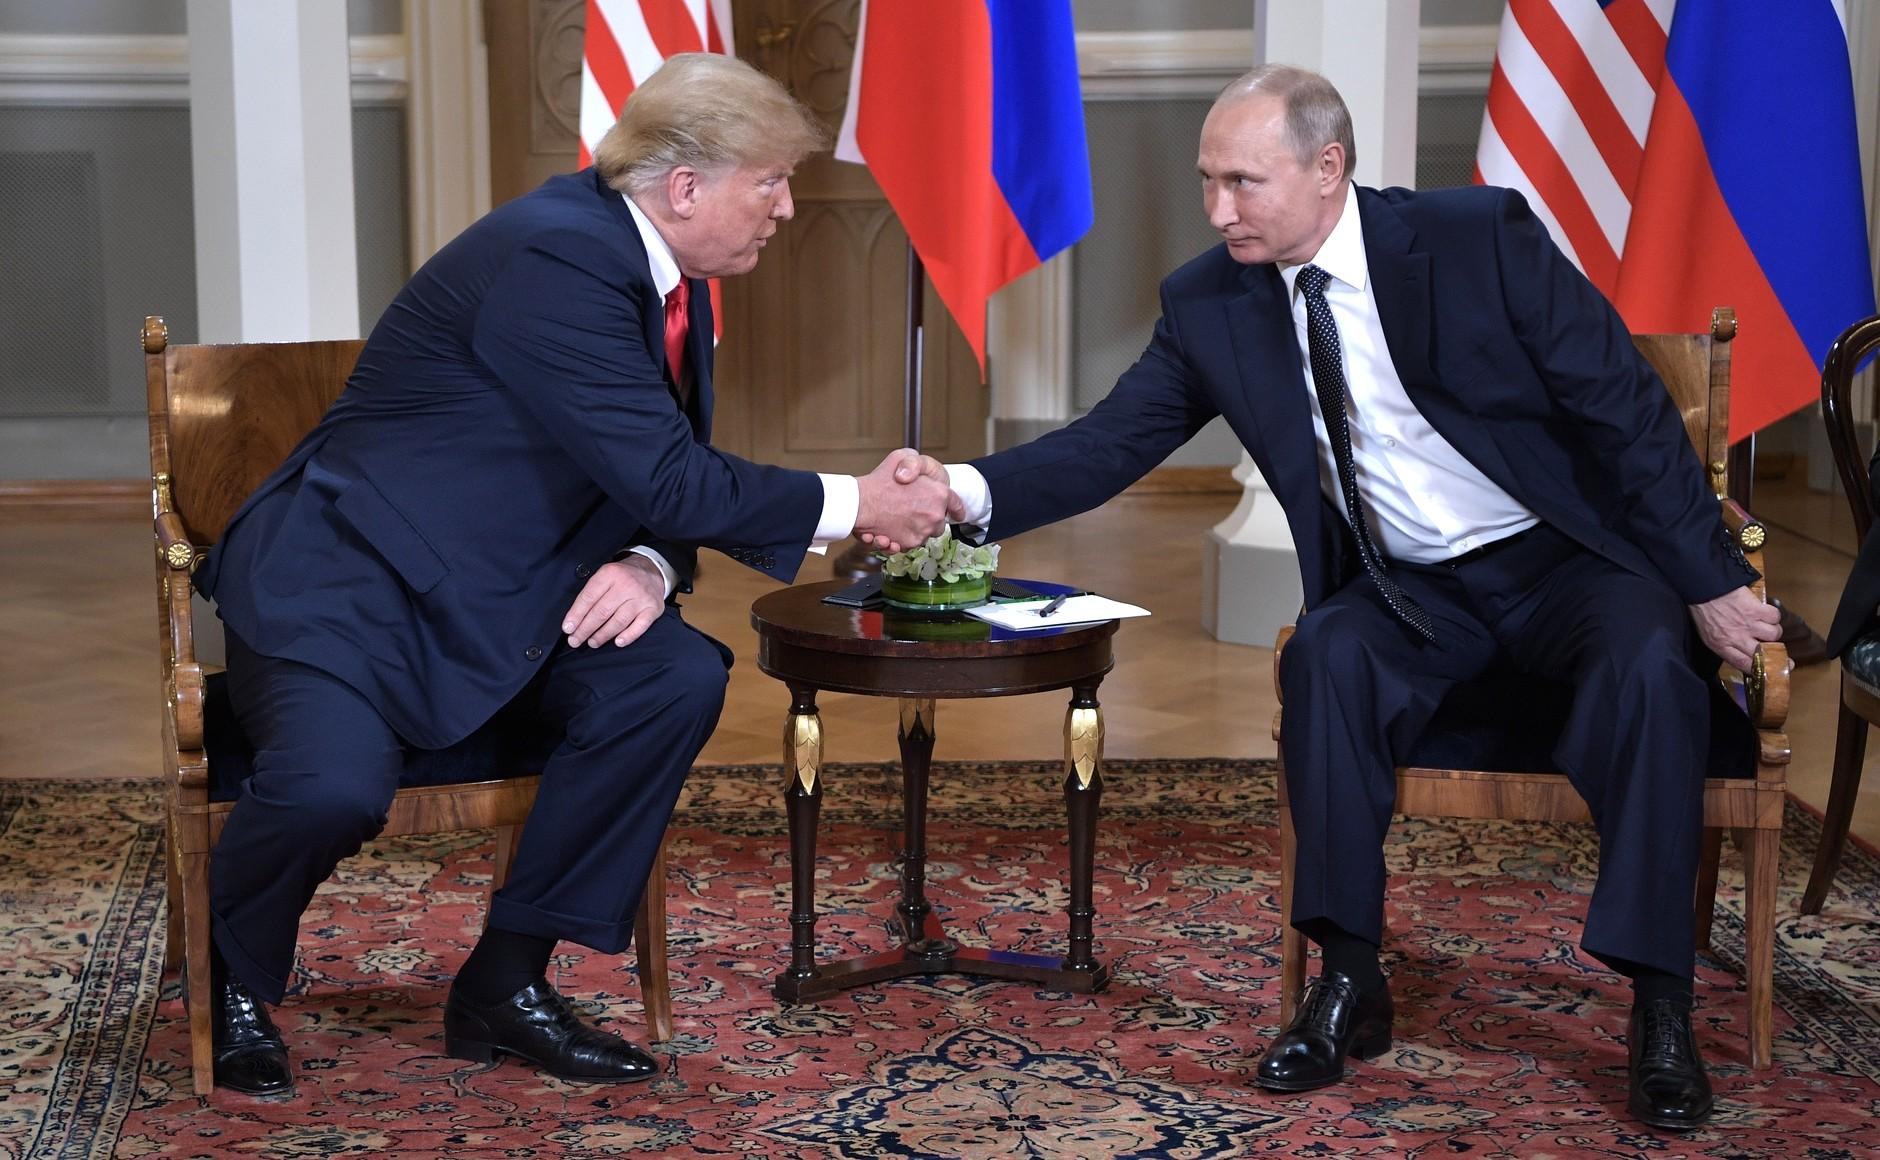 U.S. President Donald Trump (left) and Russian President Vladimir Putin (right) meet in Helsinki, Finland in July 2018. Photo Credit: Kremlin.ru